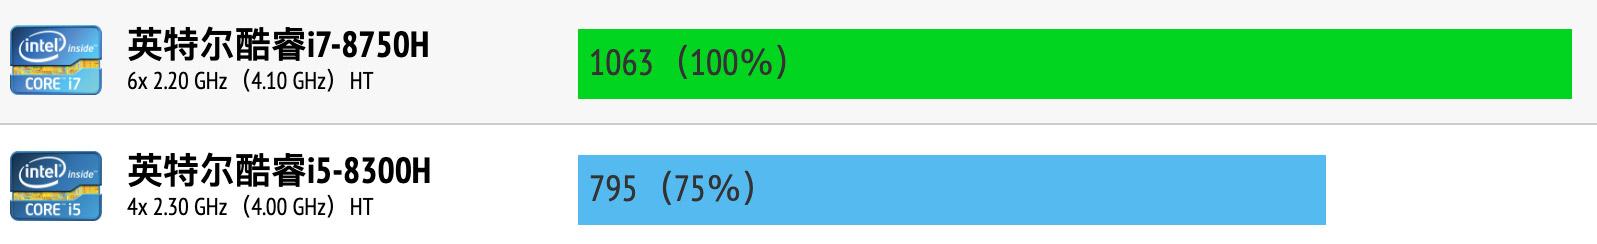 Intel Core i7-8750H和i5-8300H性能跑分对比评测